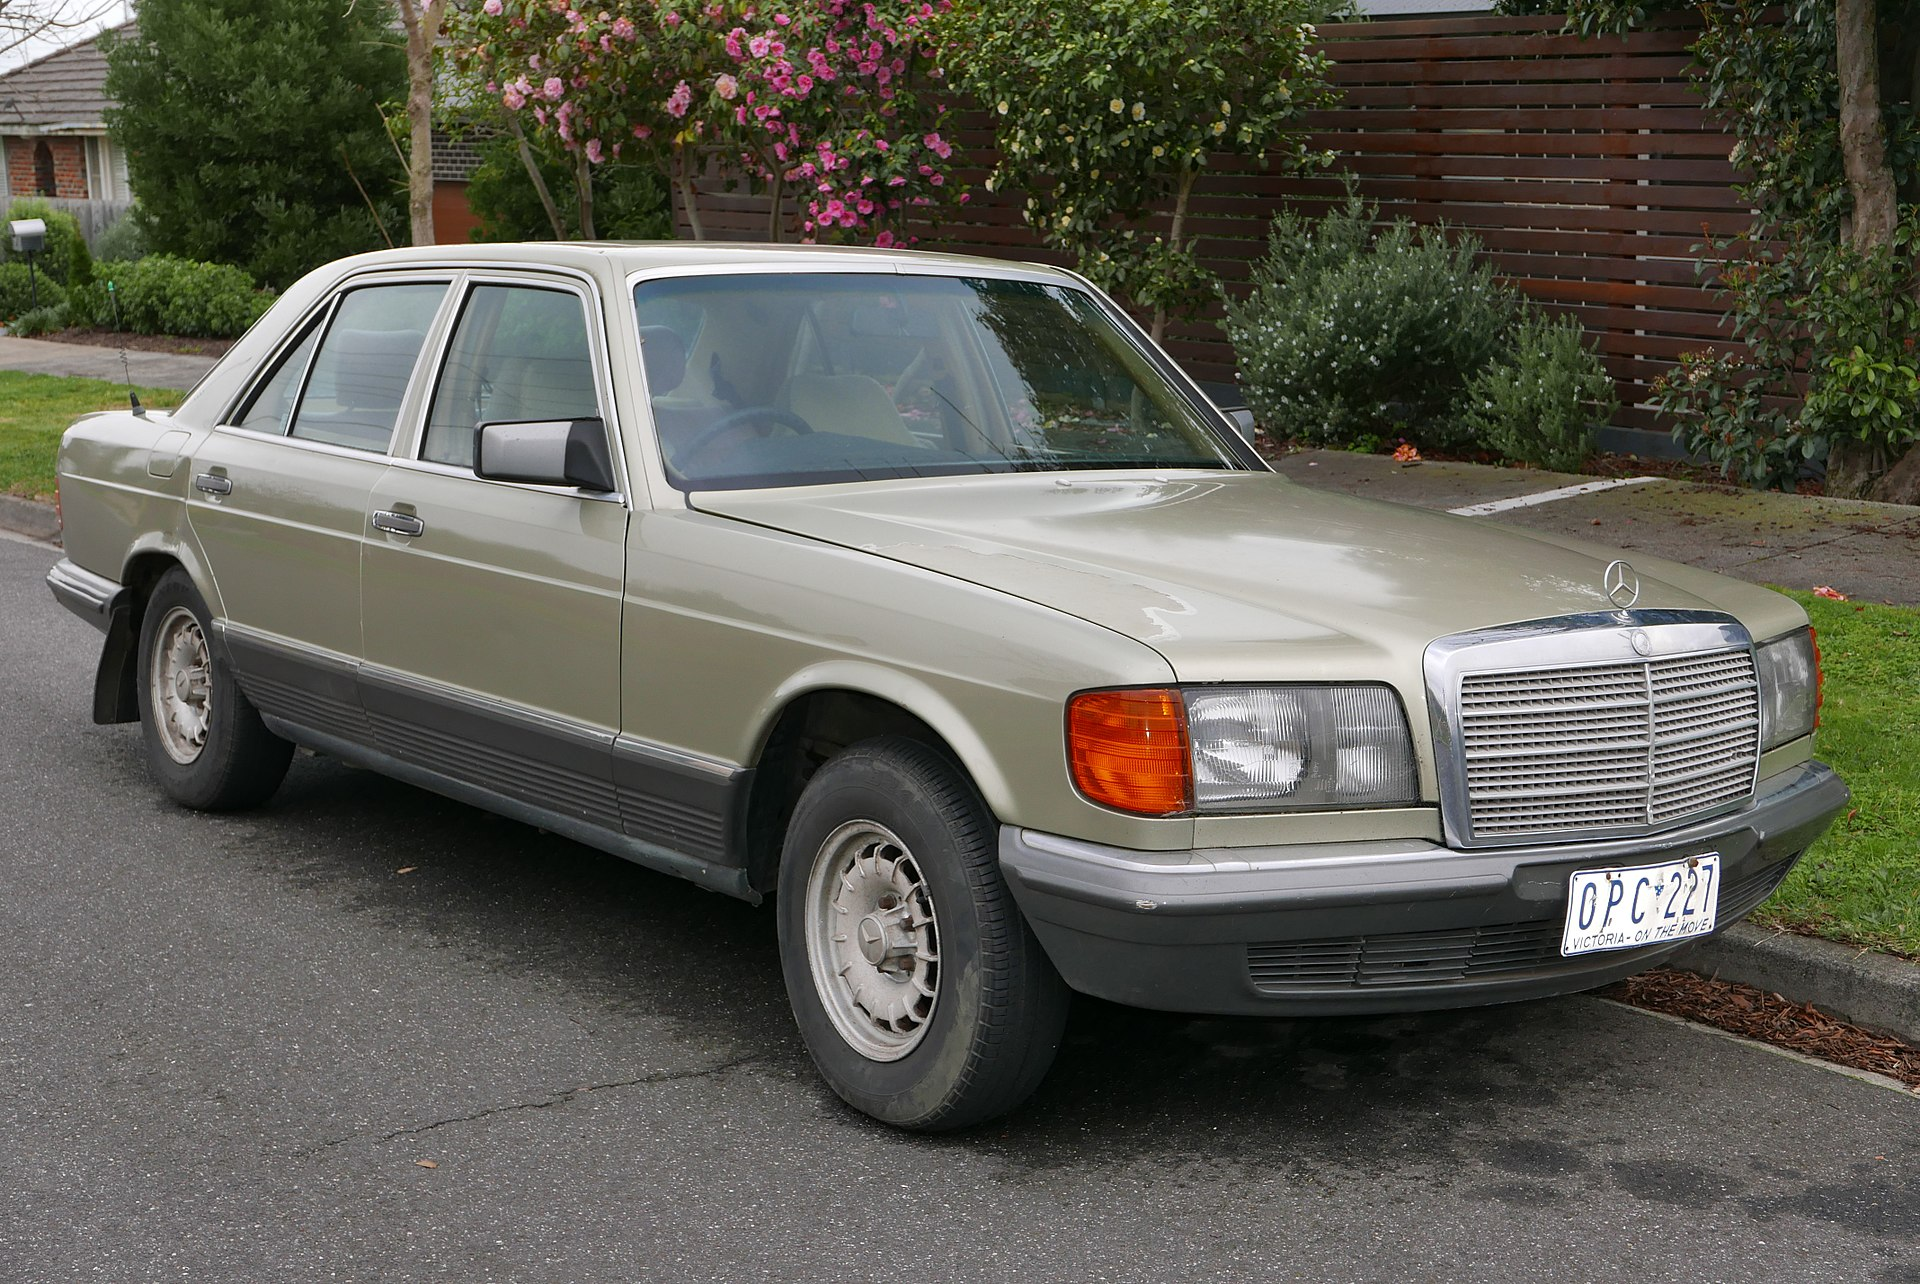 126 Model Series